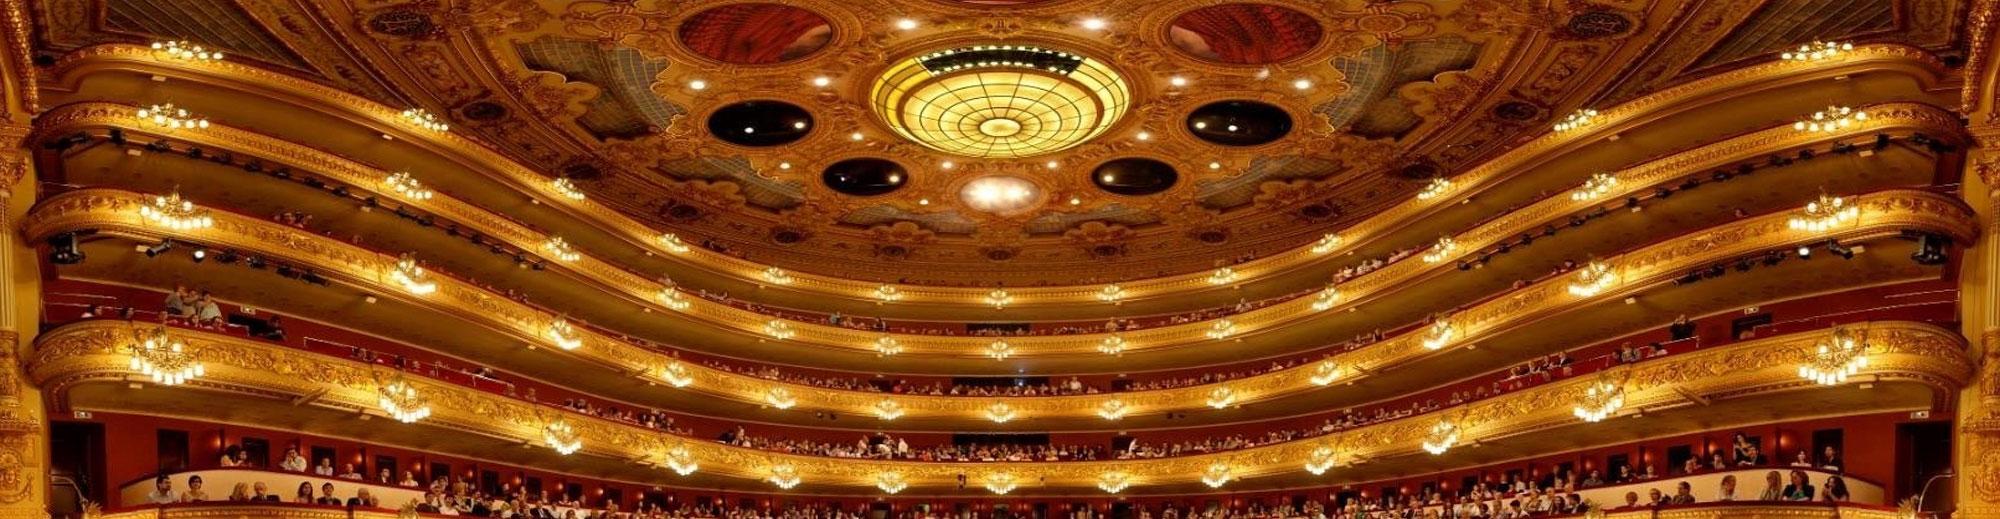 Rubén Amoretti makes his debut at the Gran Teatre del Liceu in Barcelona